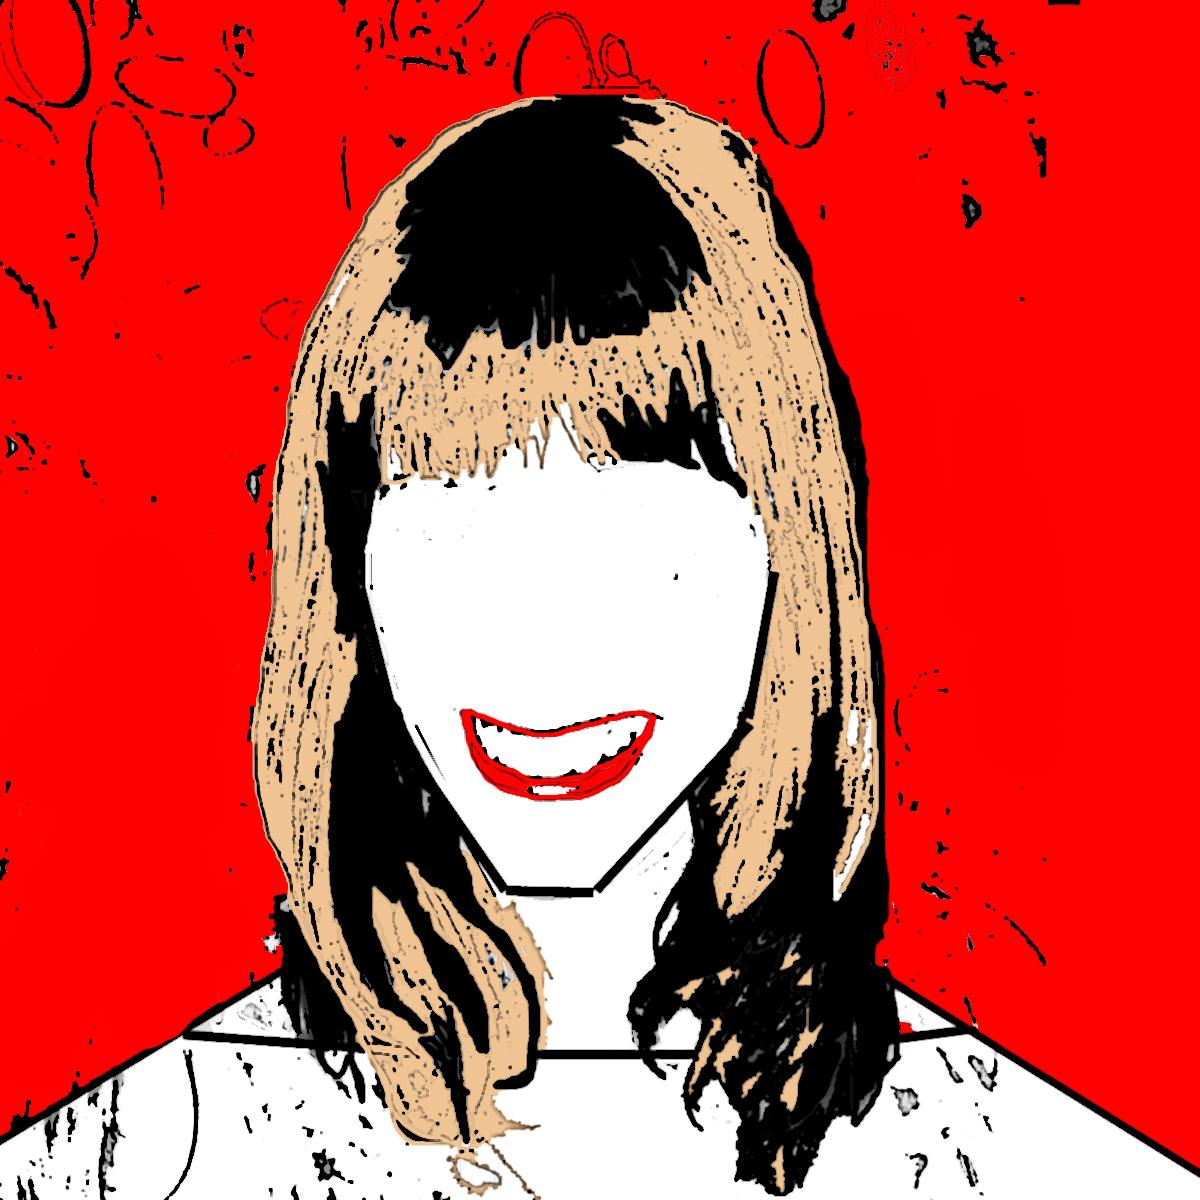 Portia Krieger